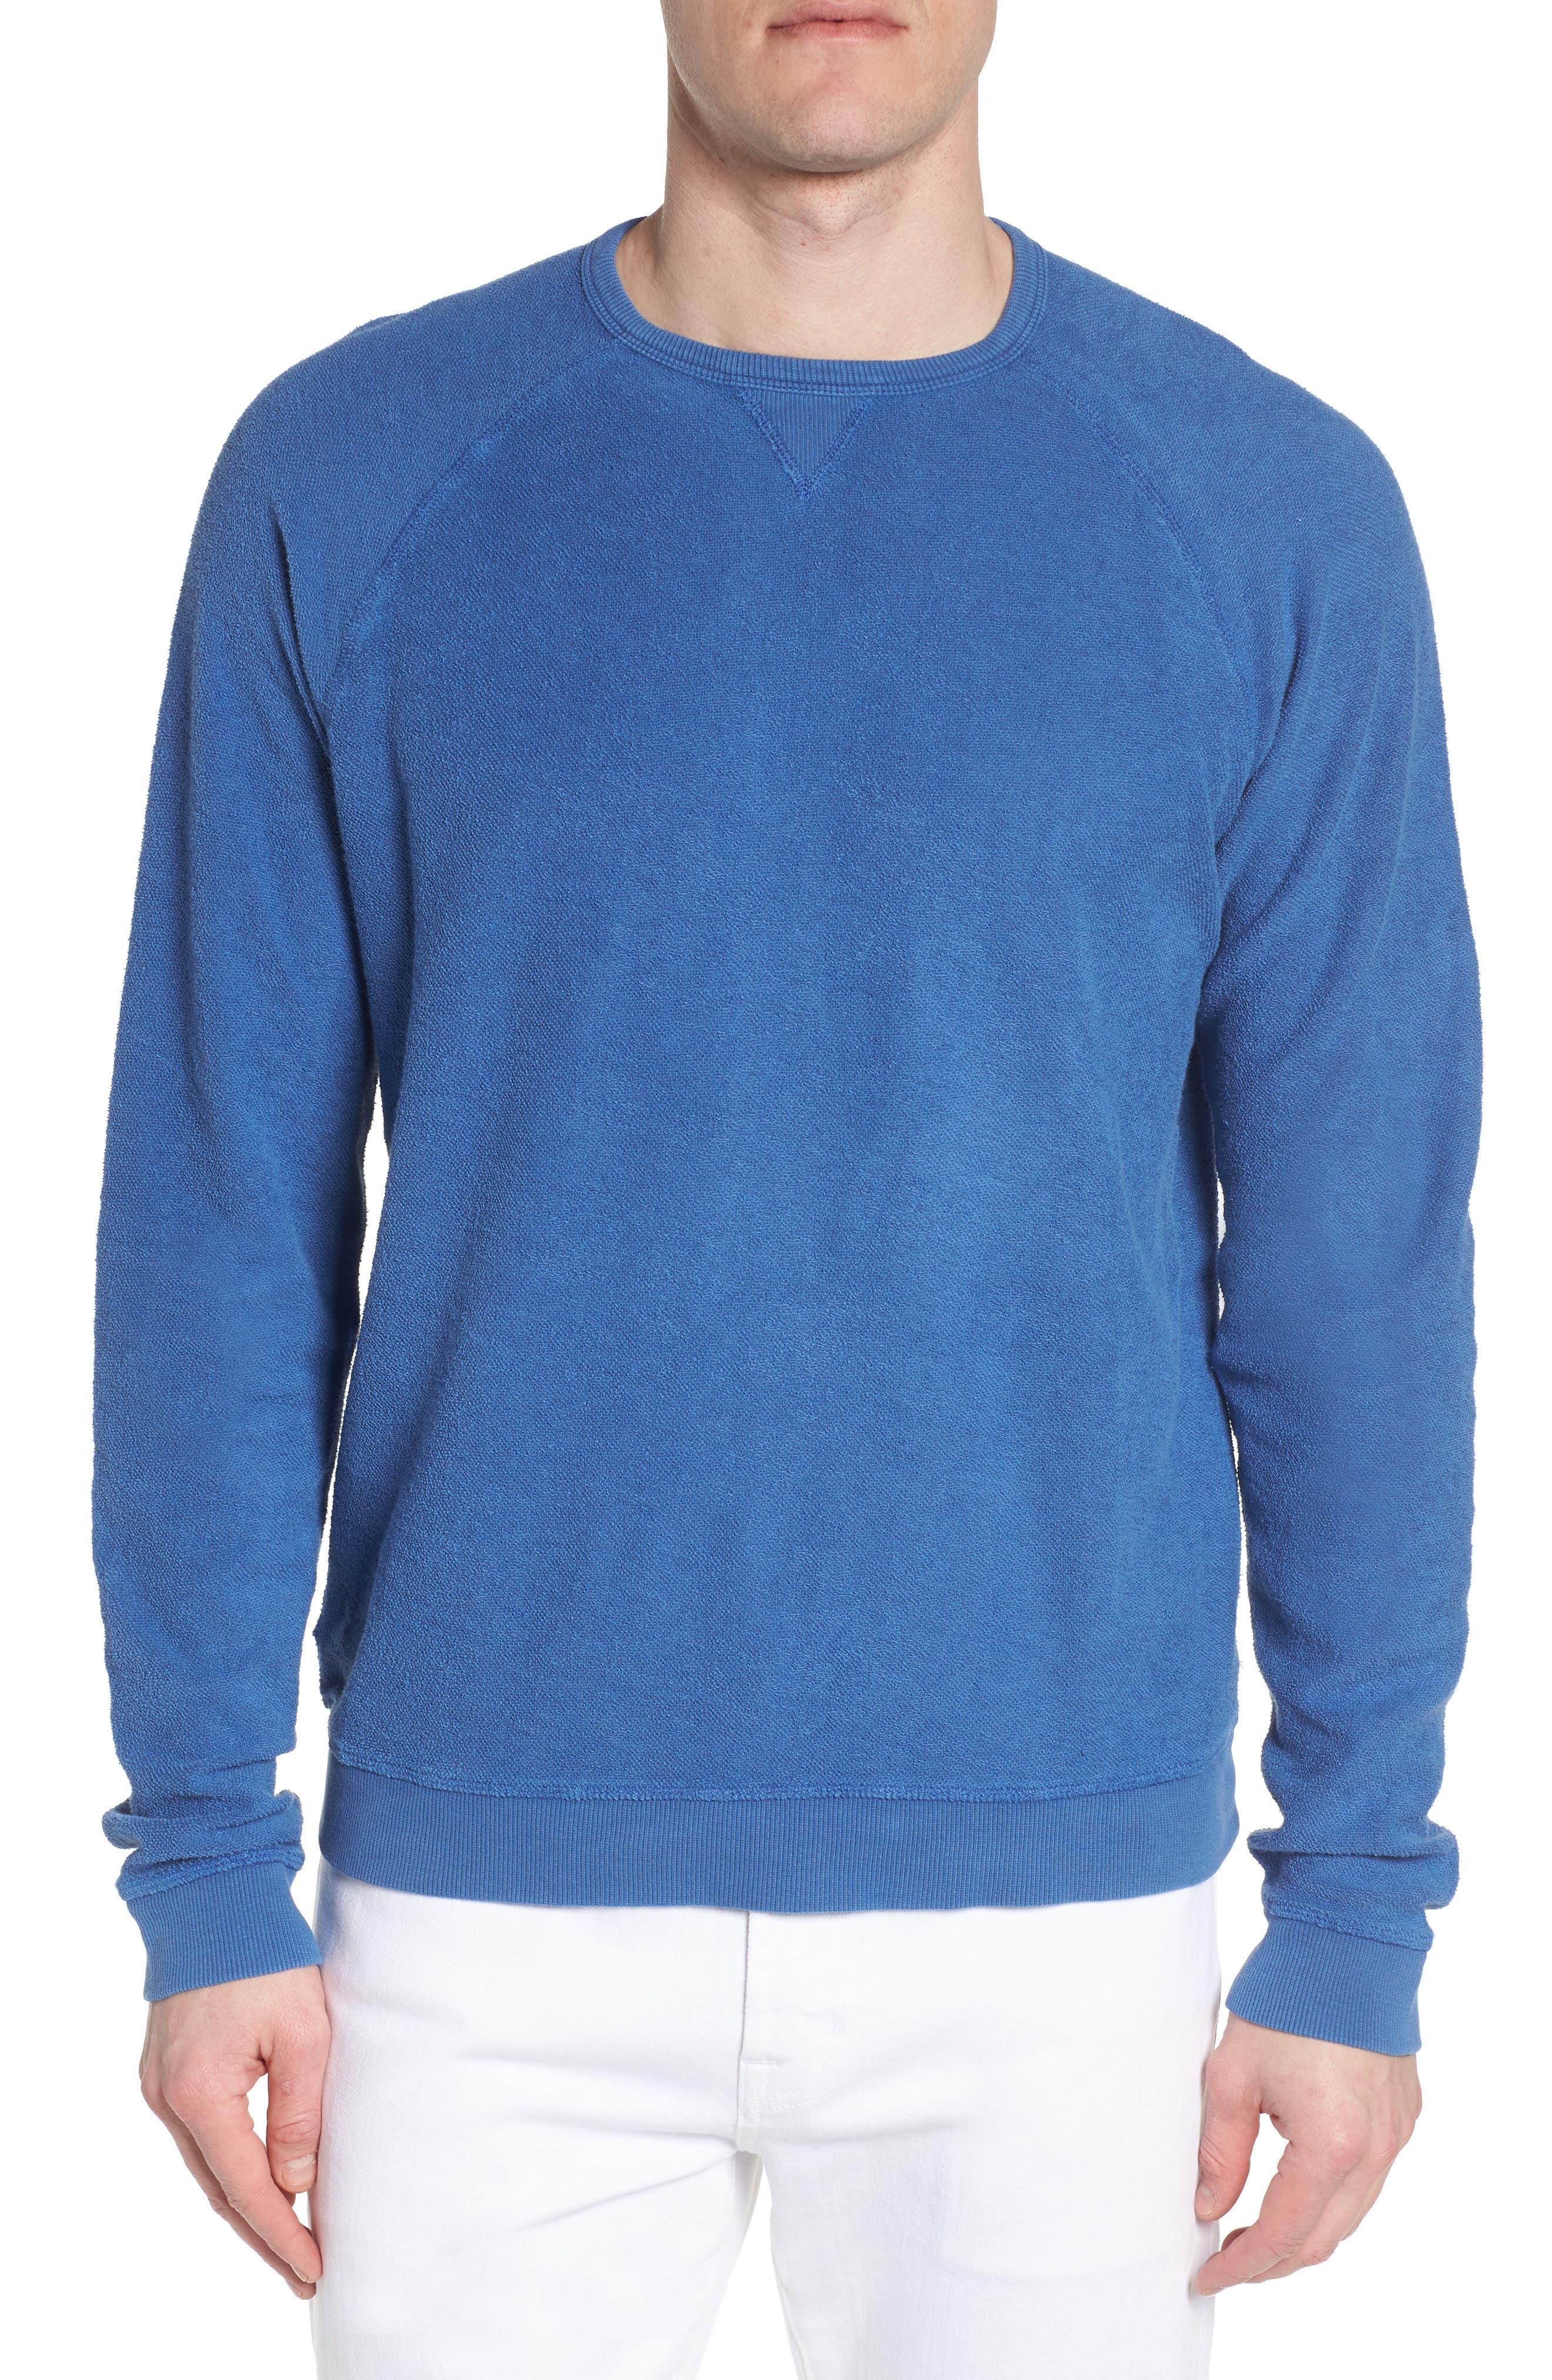 Mason Regular Fit Sweatshirt,                             Main thumbnail 1, color,                             TIDE